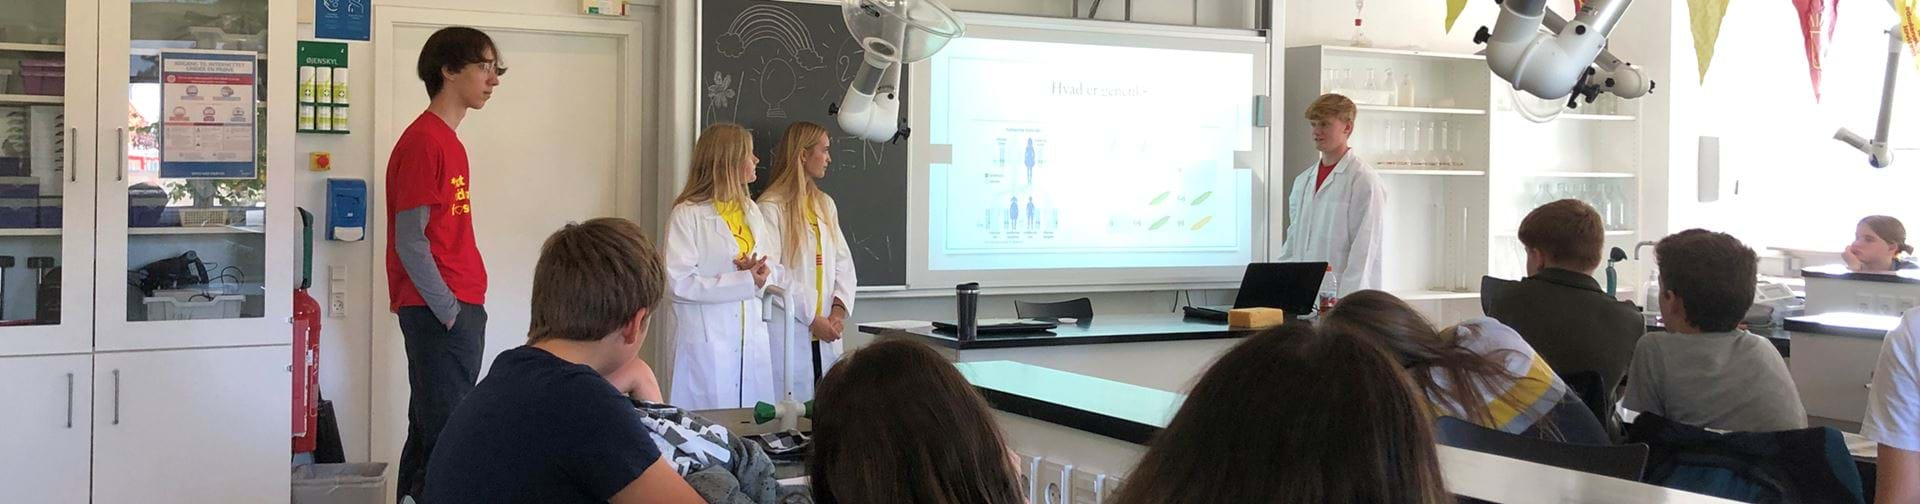 Elever i kemilokalet